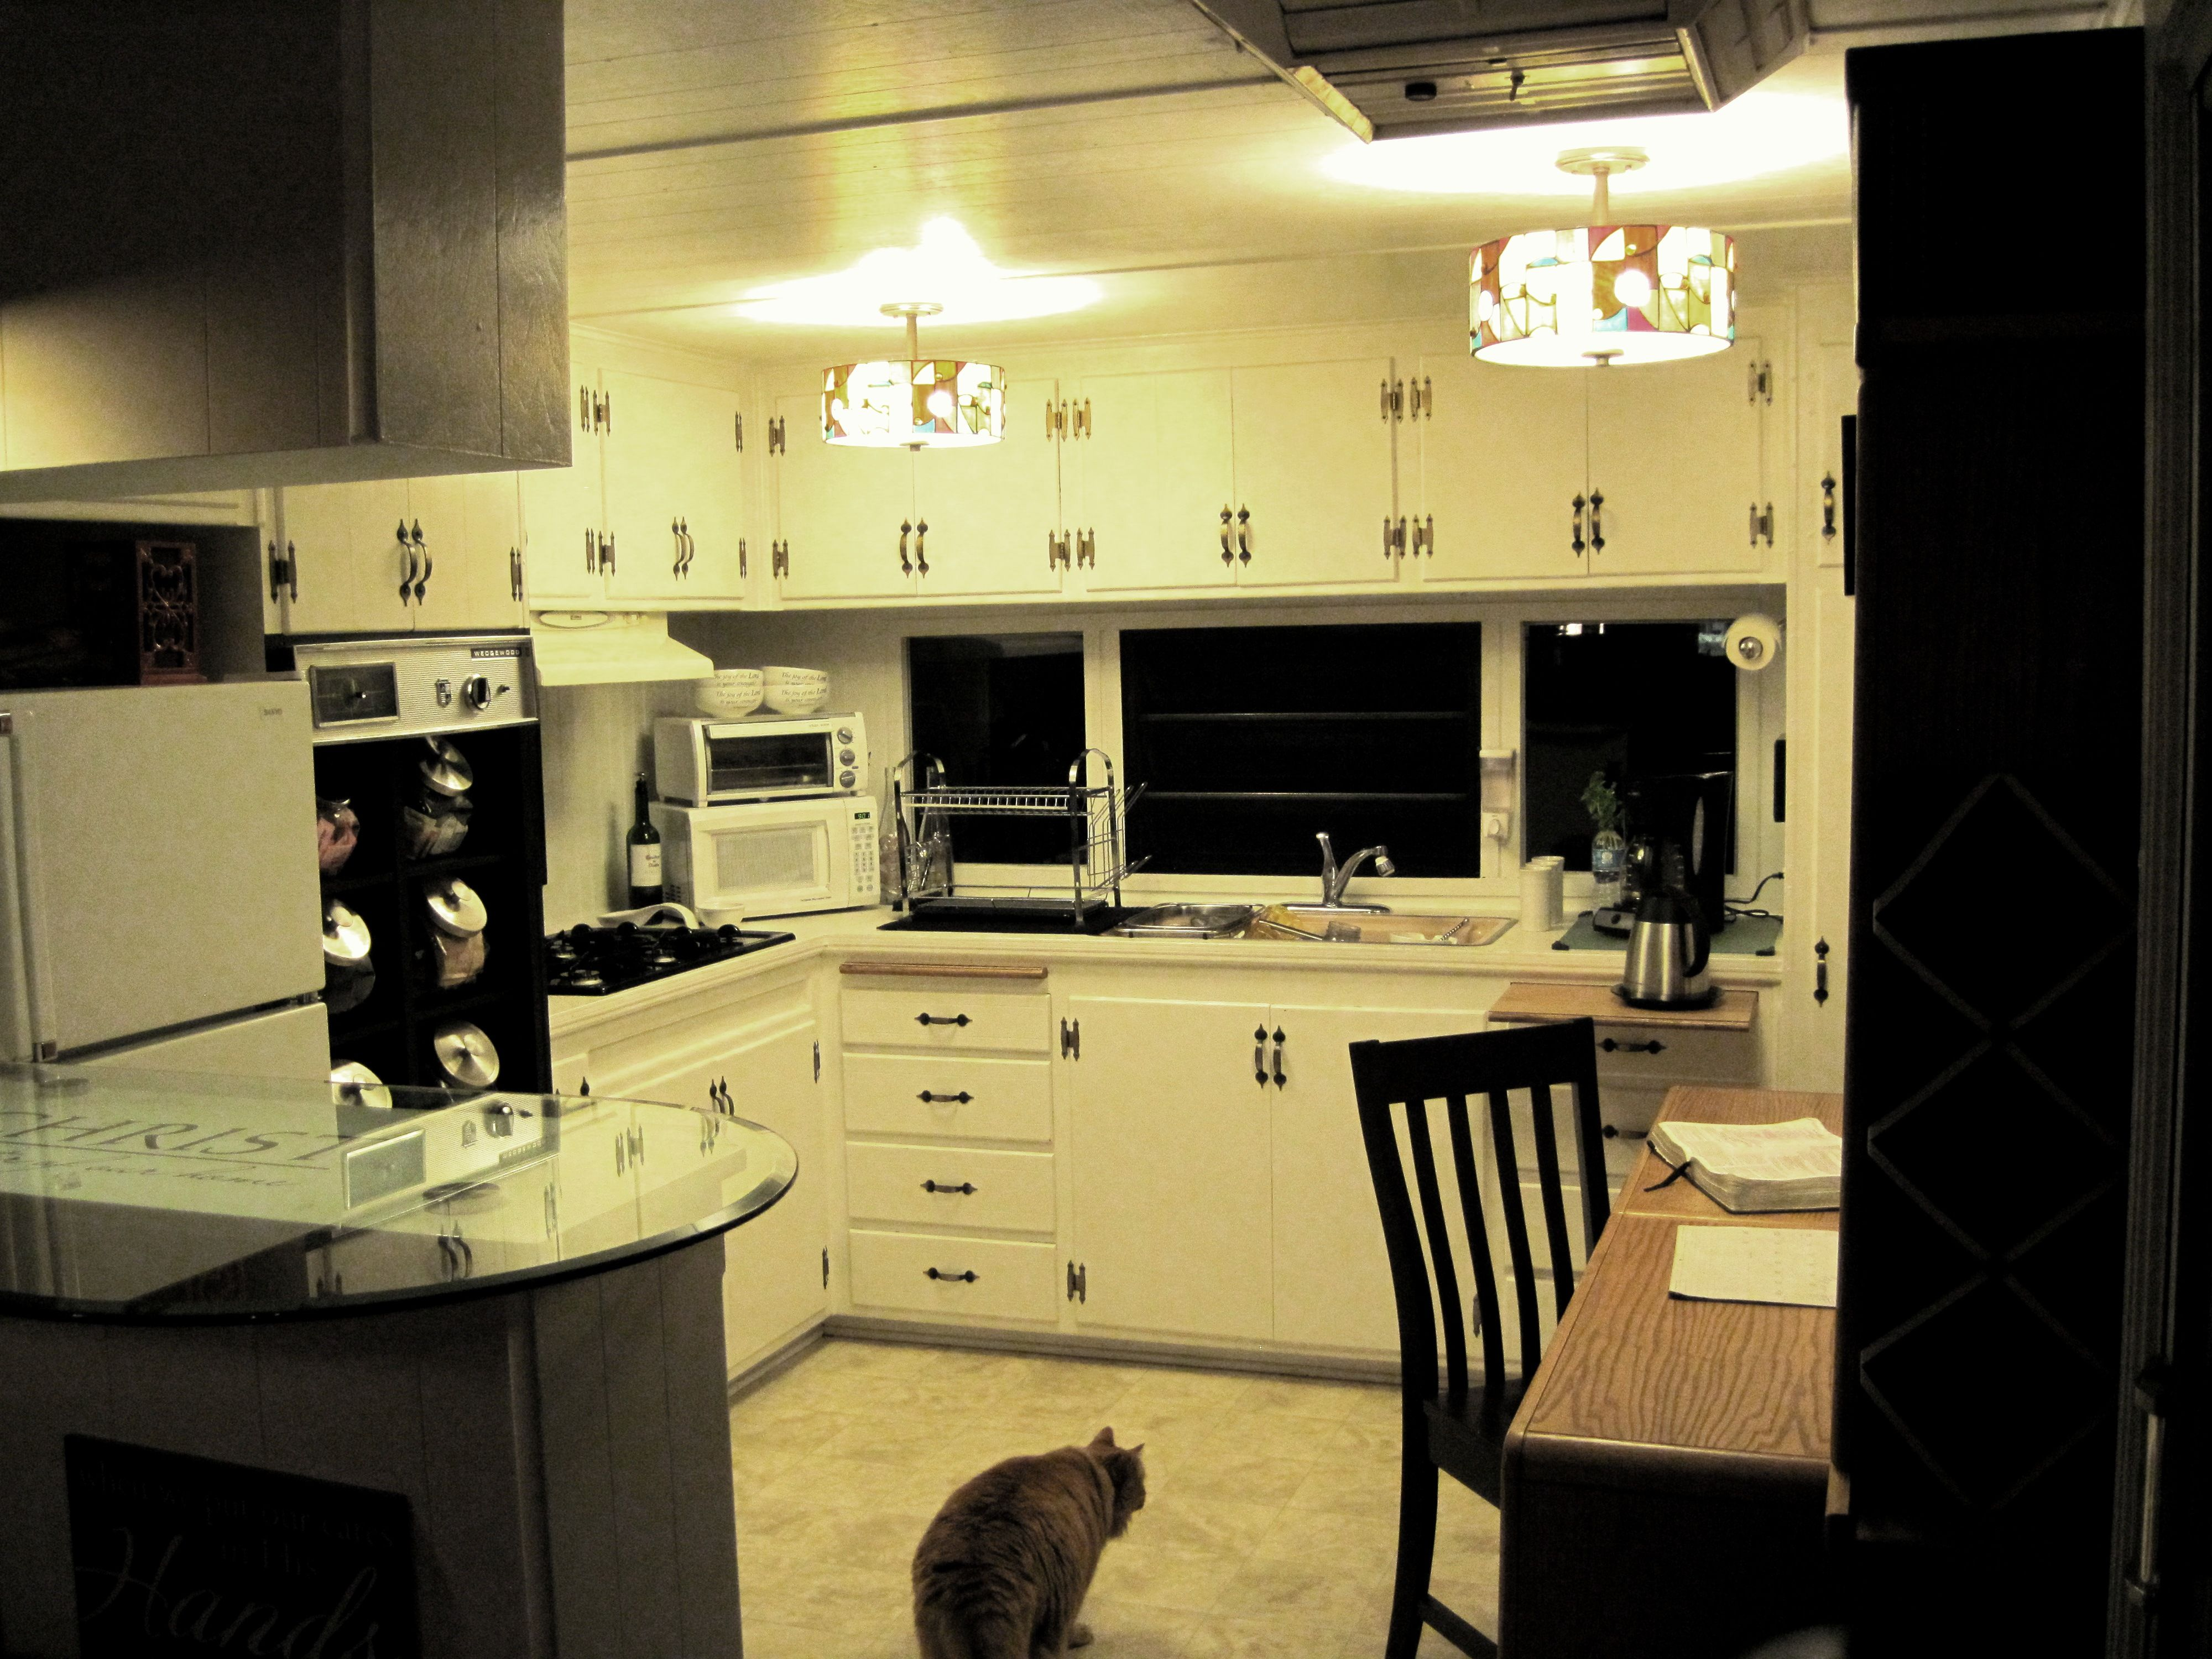 Kitchen Remodel For Mobile Homes Kitchen Remodel Mobile Home Single Wide Renovation Mobile Home